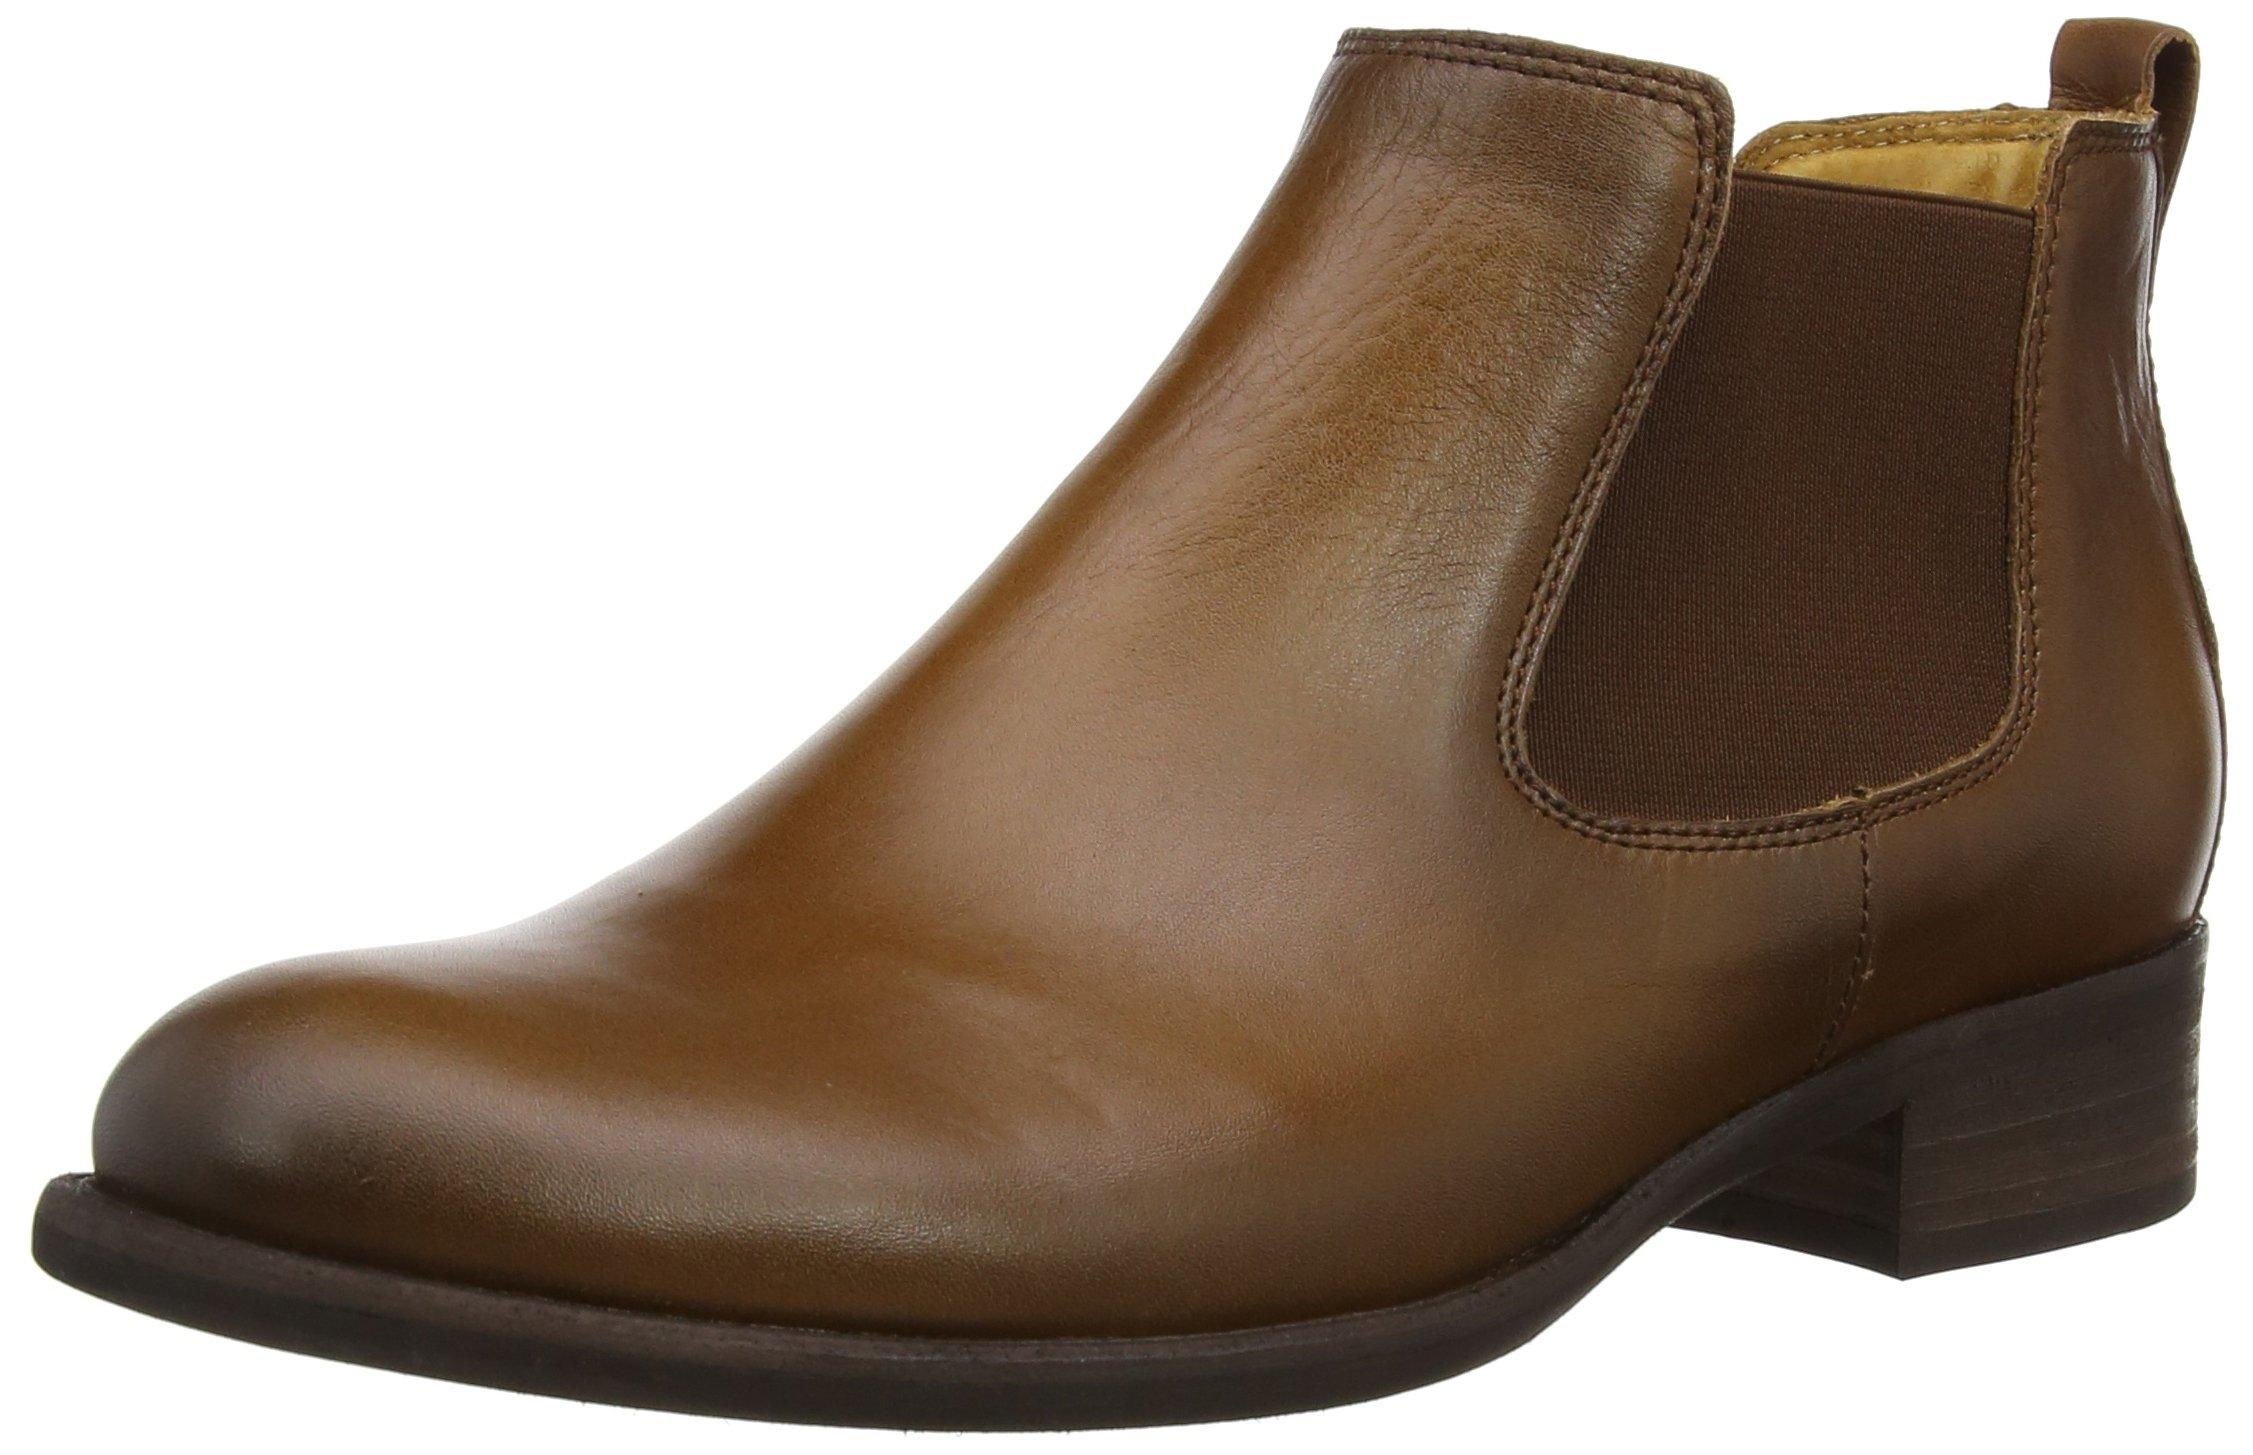 5 Shoes Gabor Eu GaborBoots FemmeBraunsatteleffekt2235 9WEDHYe2I